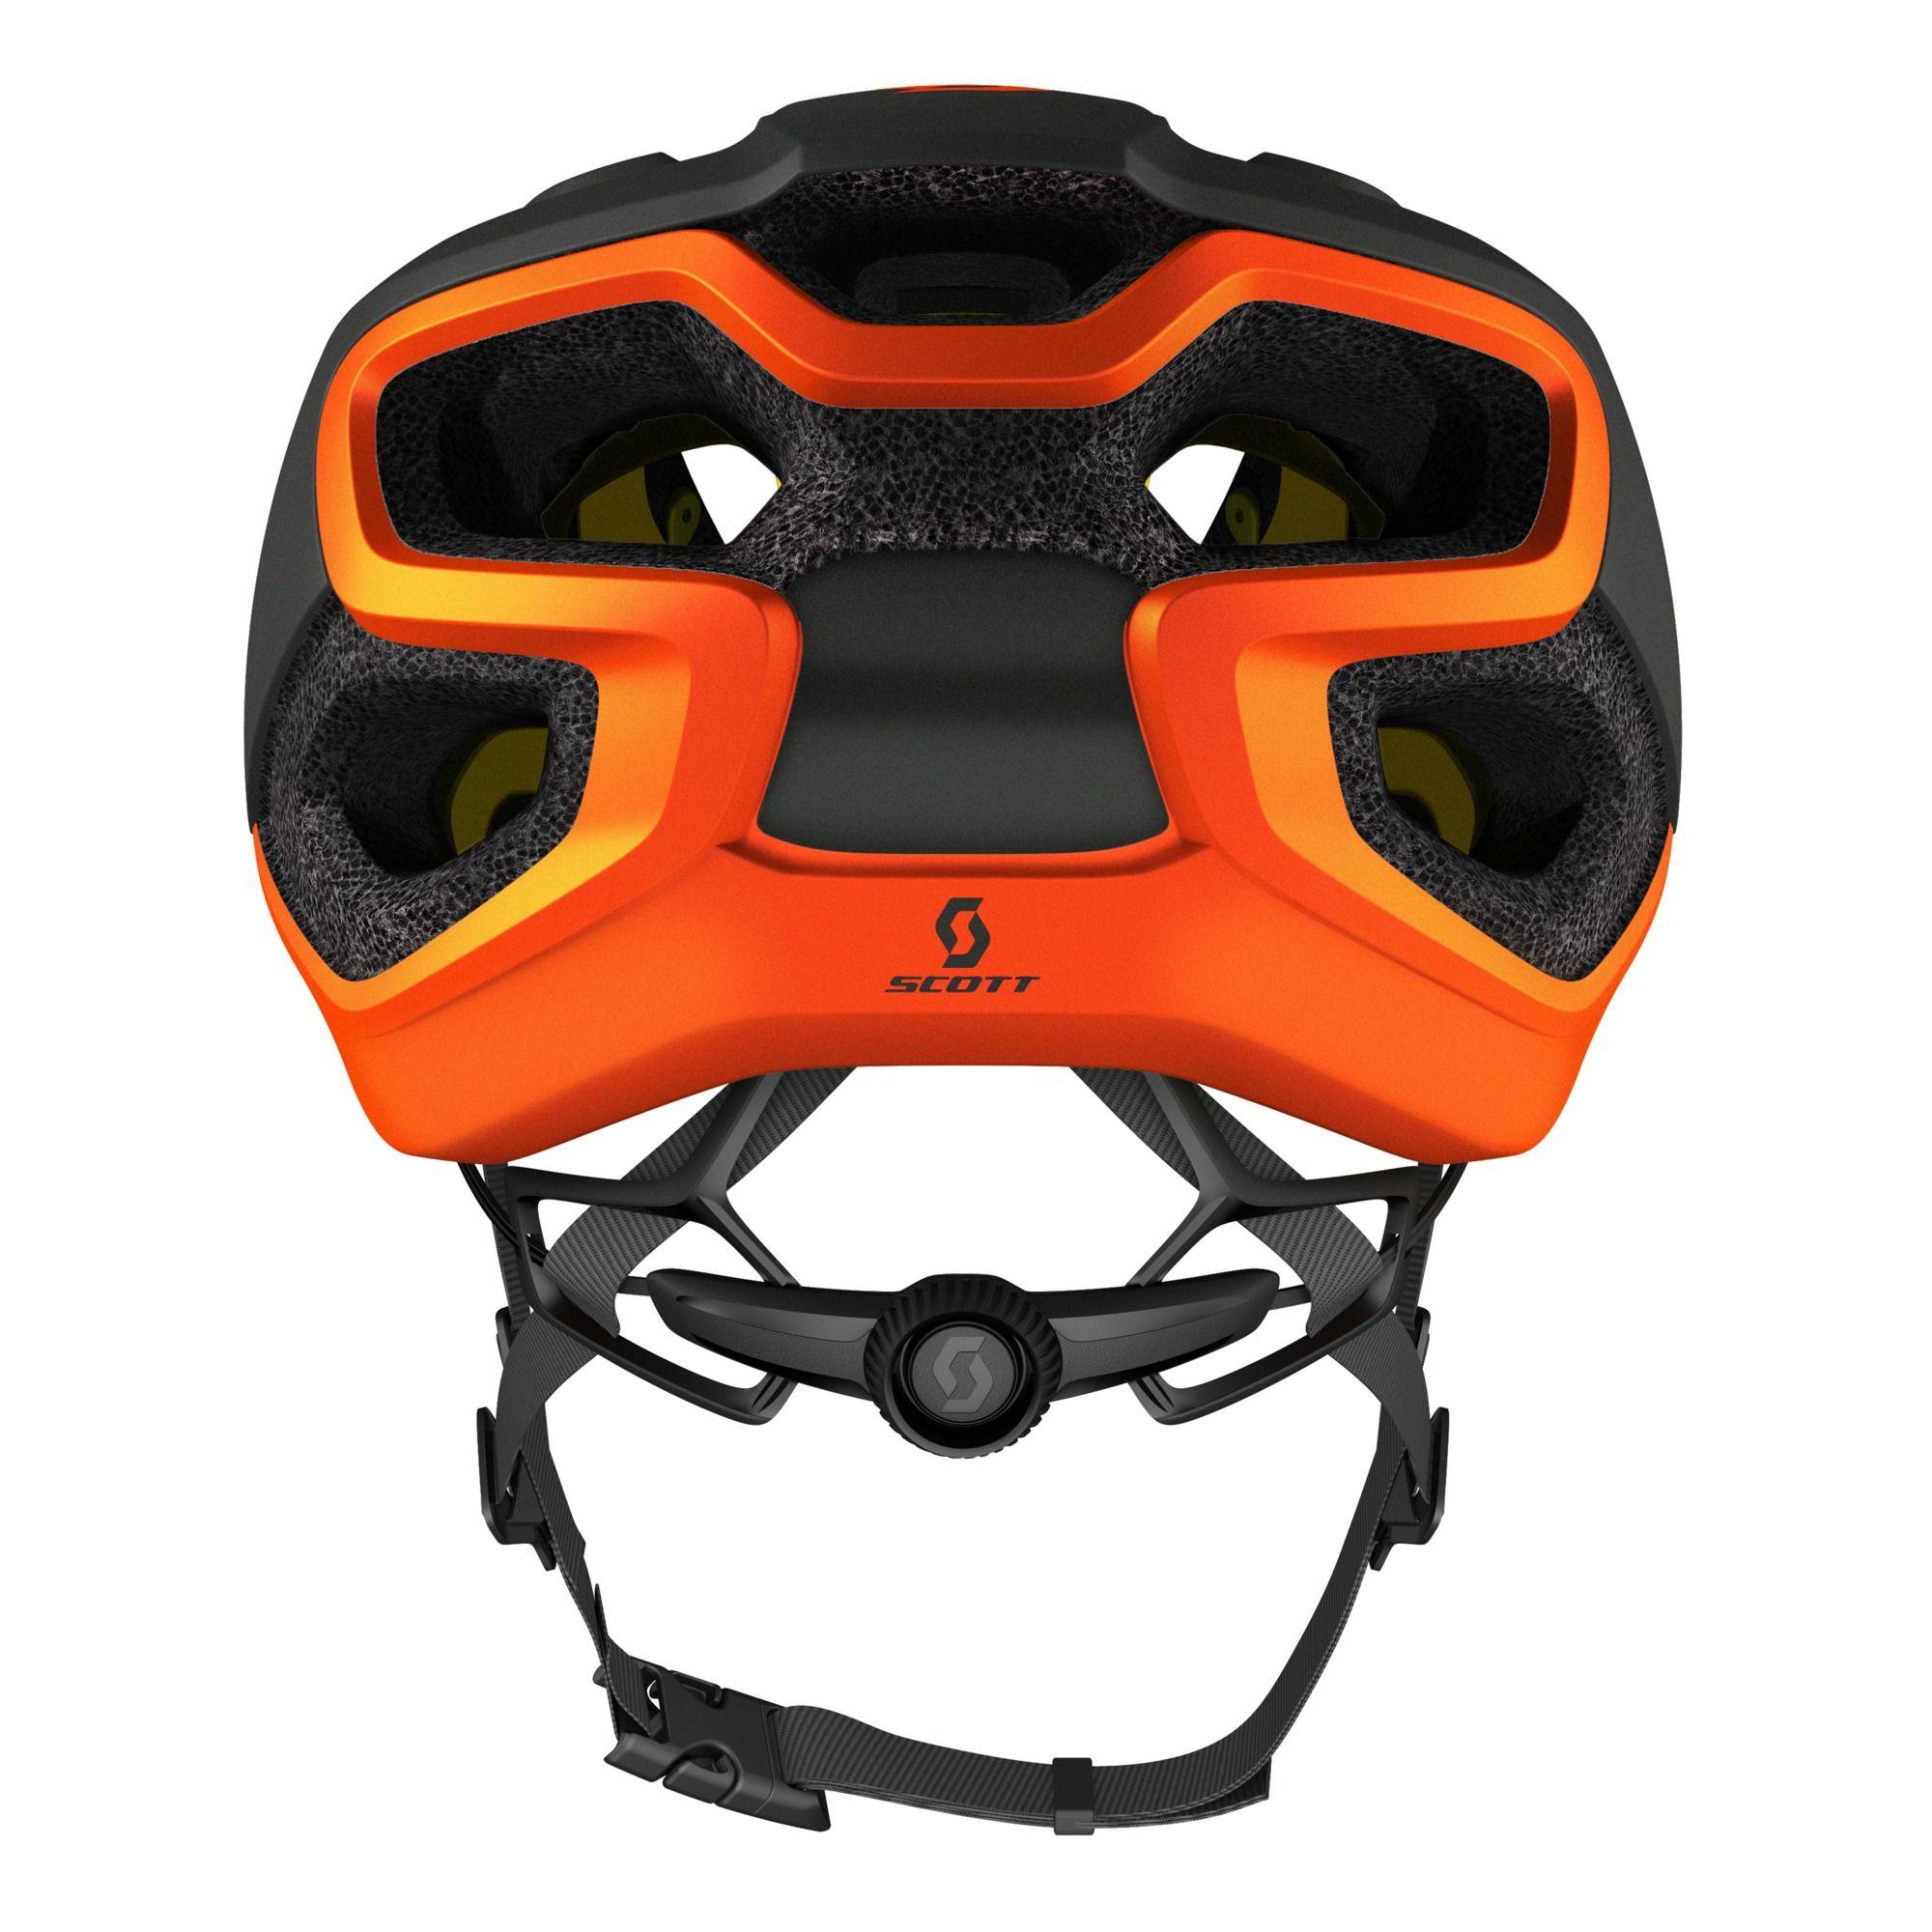 Scott Fuga Plus Ce Helmet Cycling Helmet Helmet Bicycle Safety